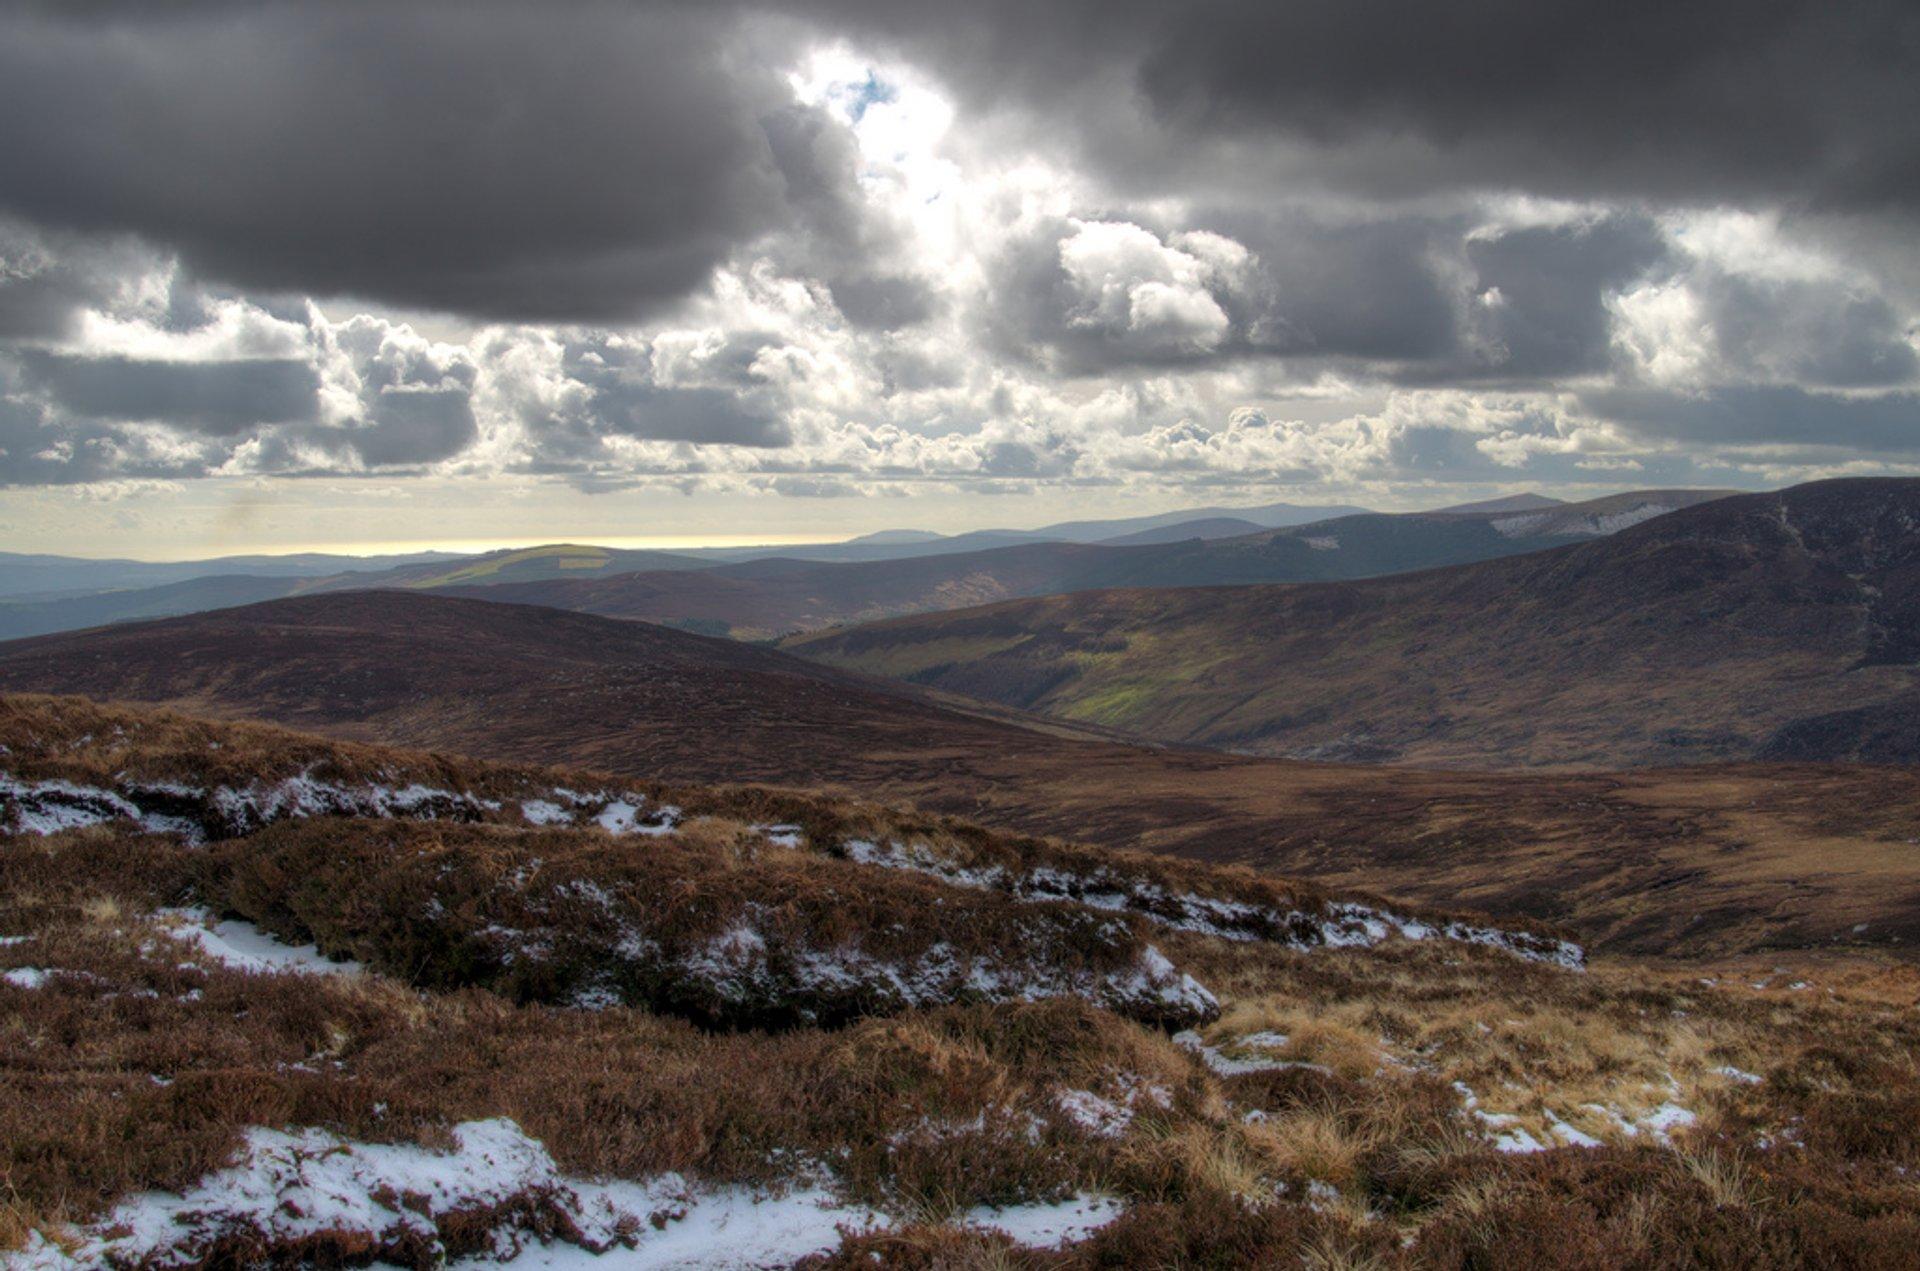 Winter in Ireland 2019 - Best Time